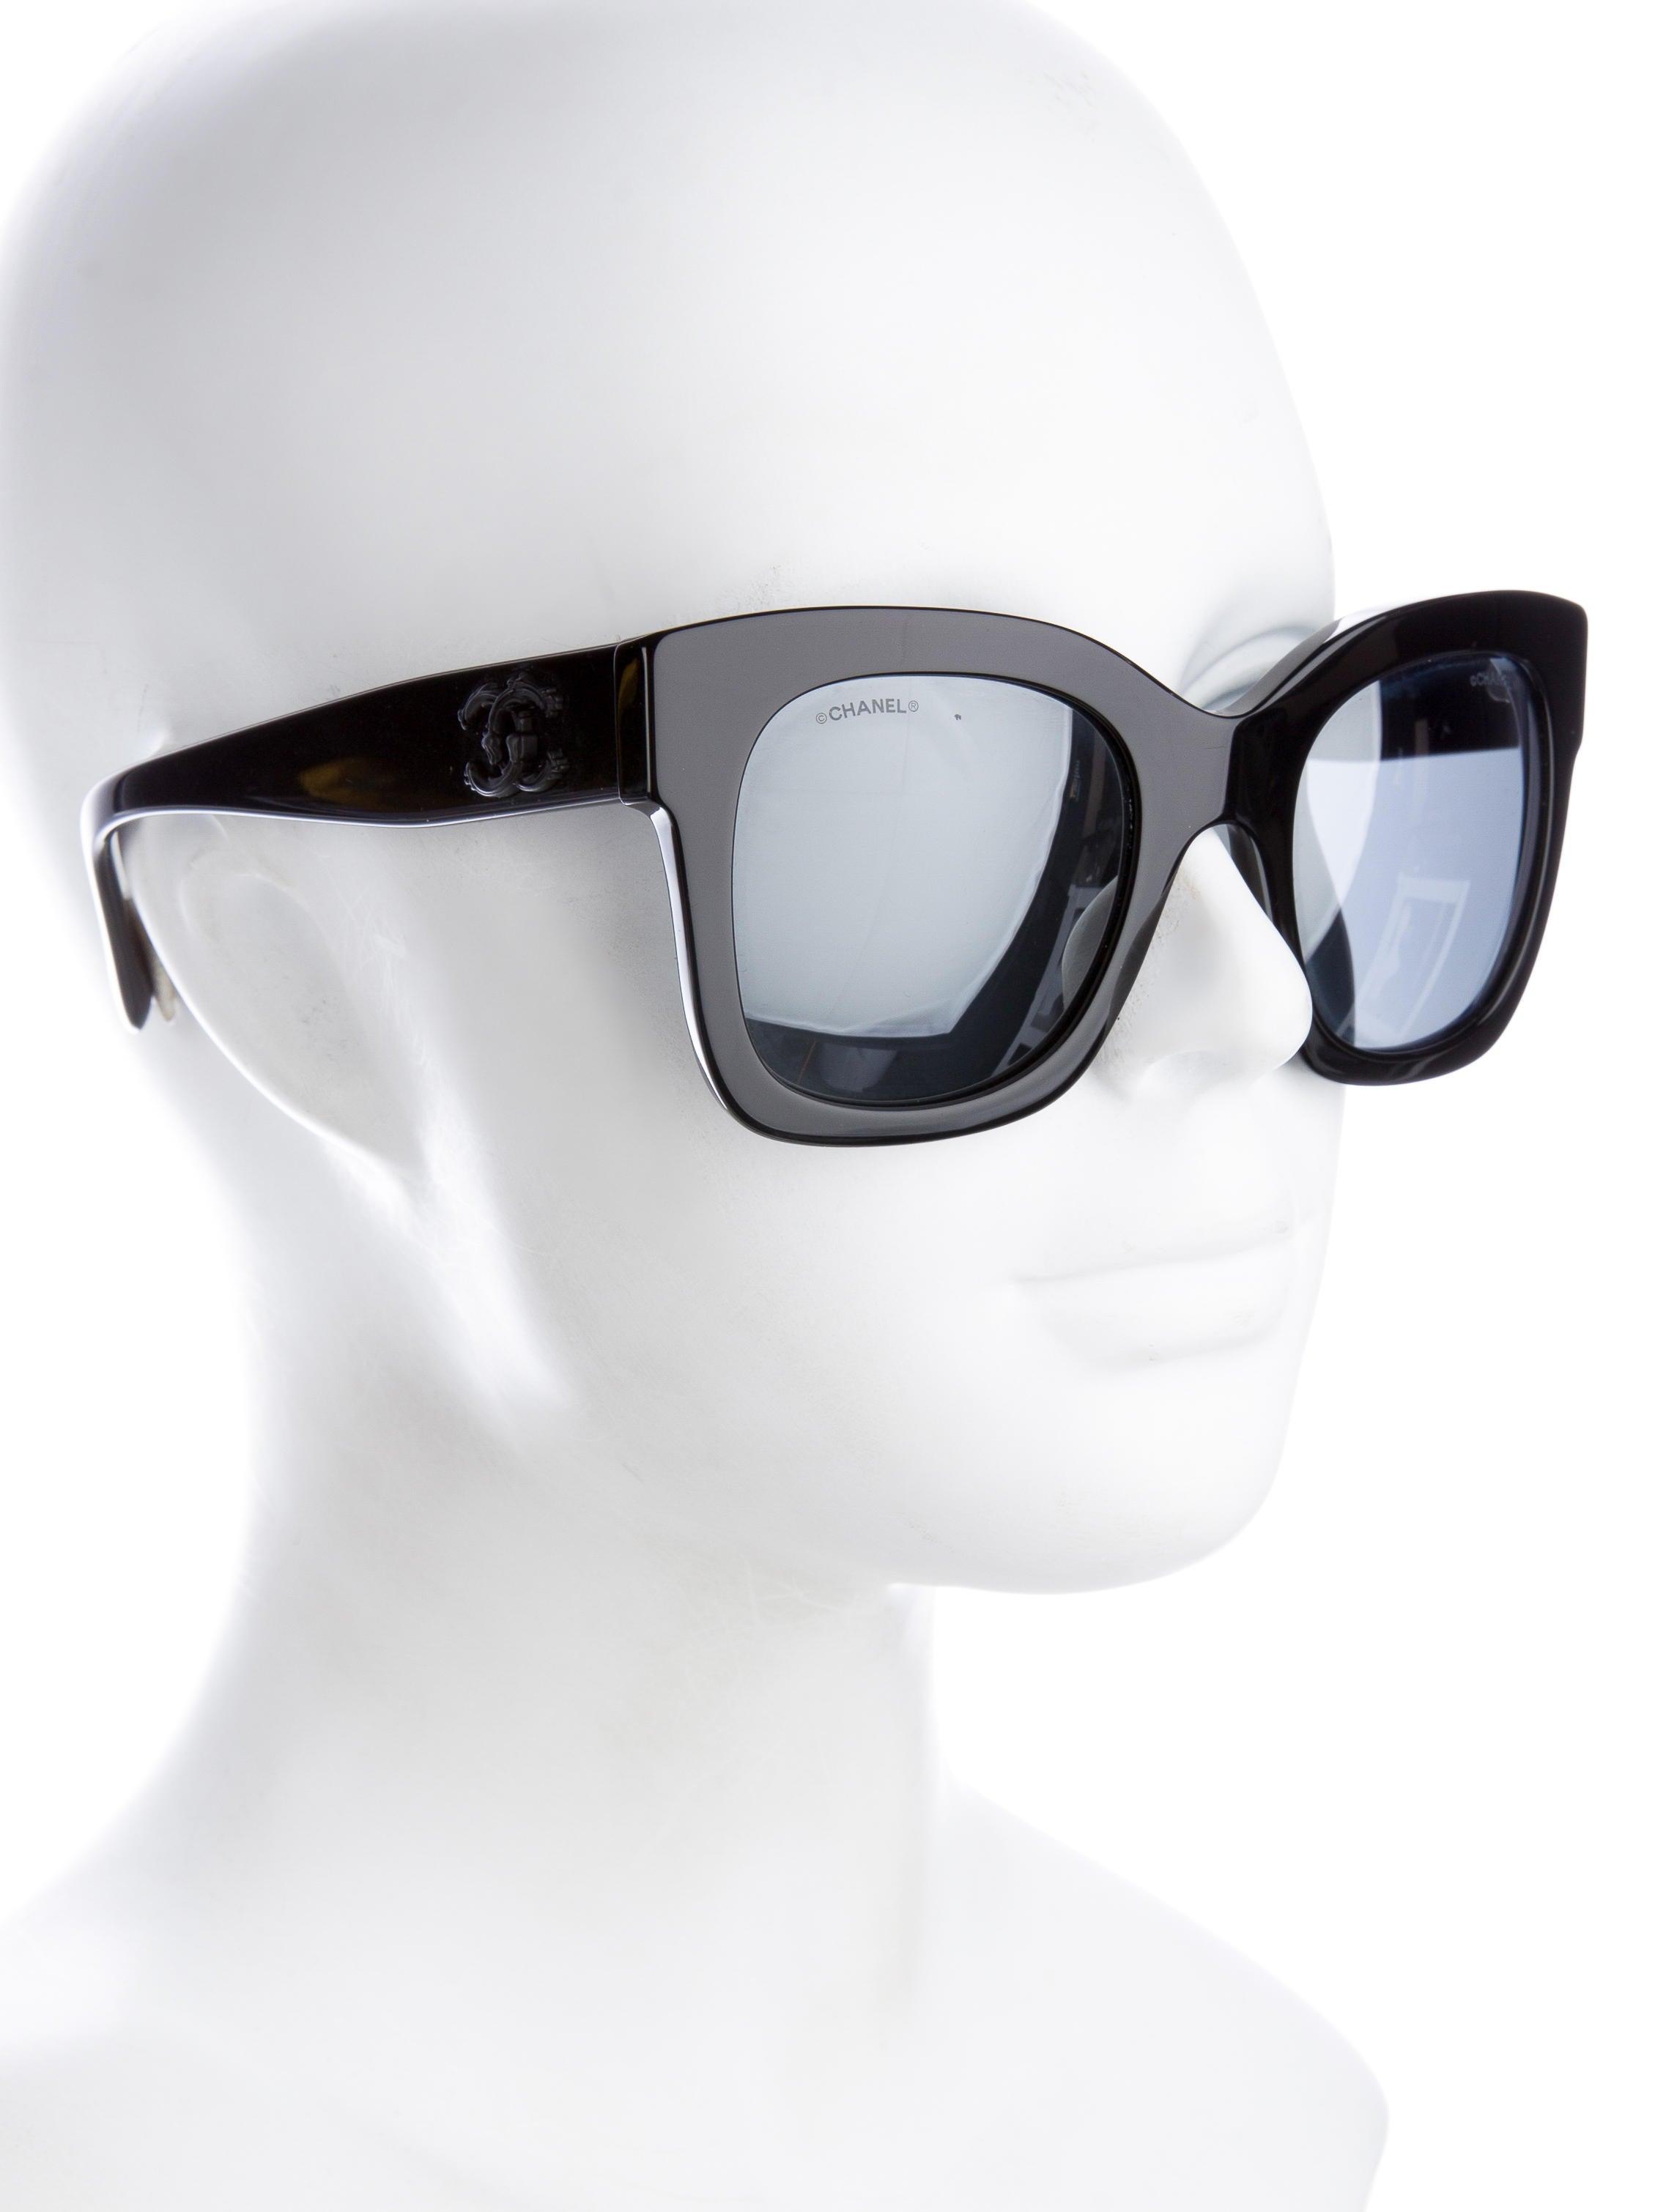 Chanel Sunglasses 2017 Mens